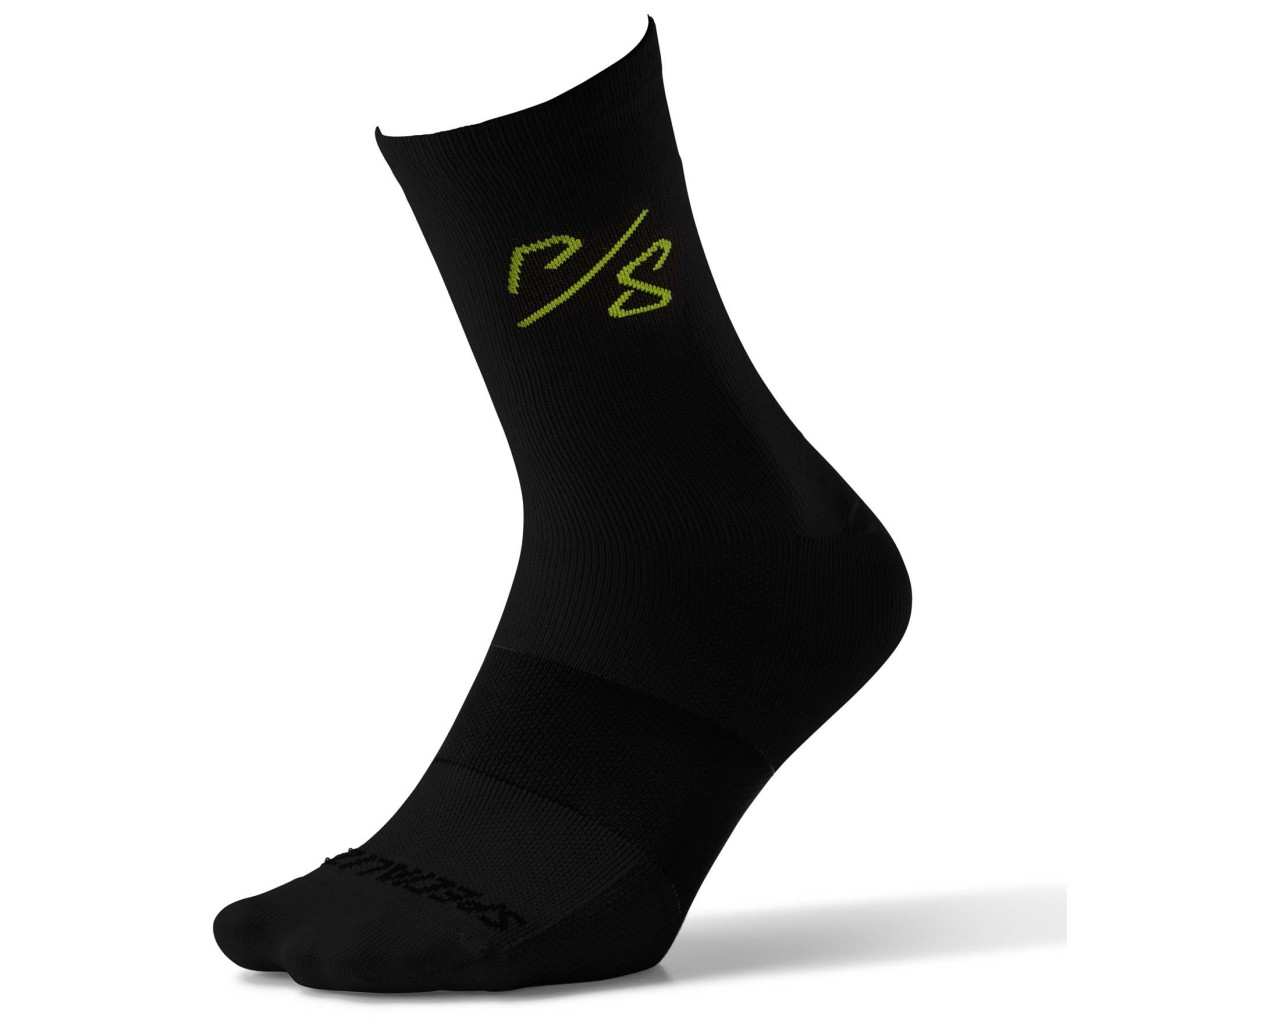 Specialized Soft Air Tall Socken Sagan Deconstructivism Green | black